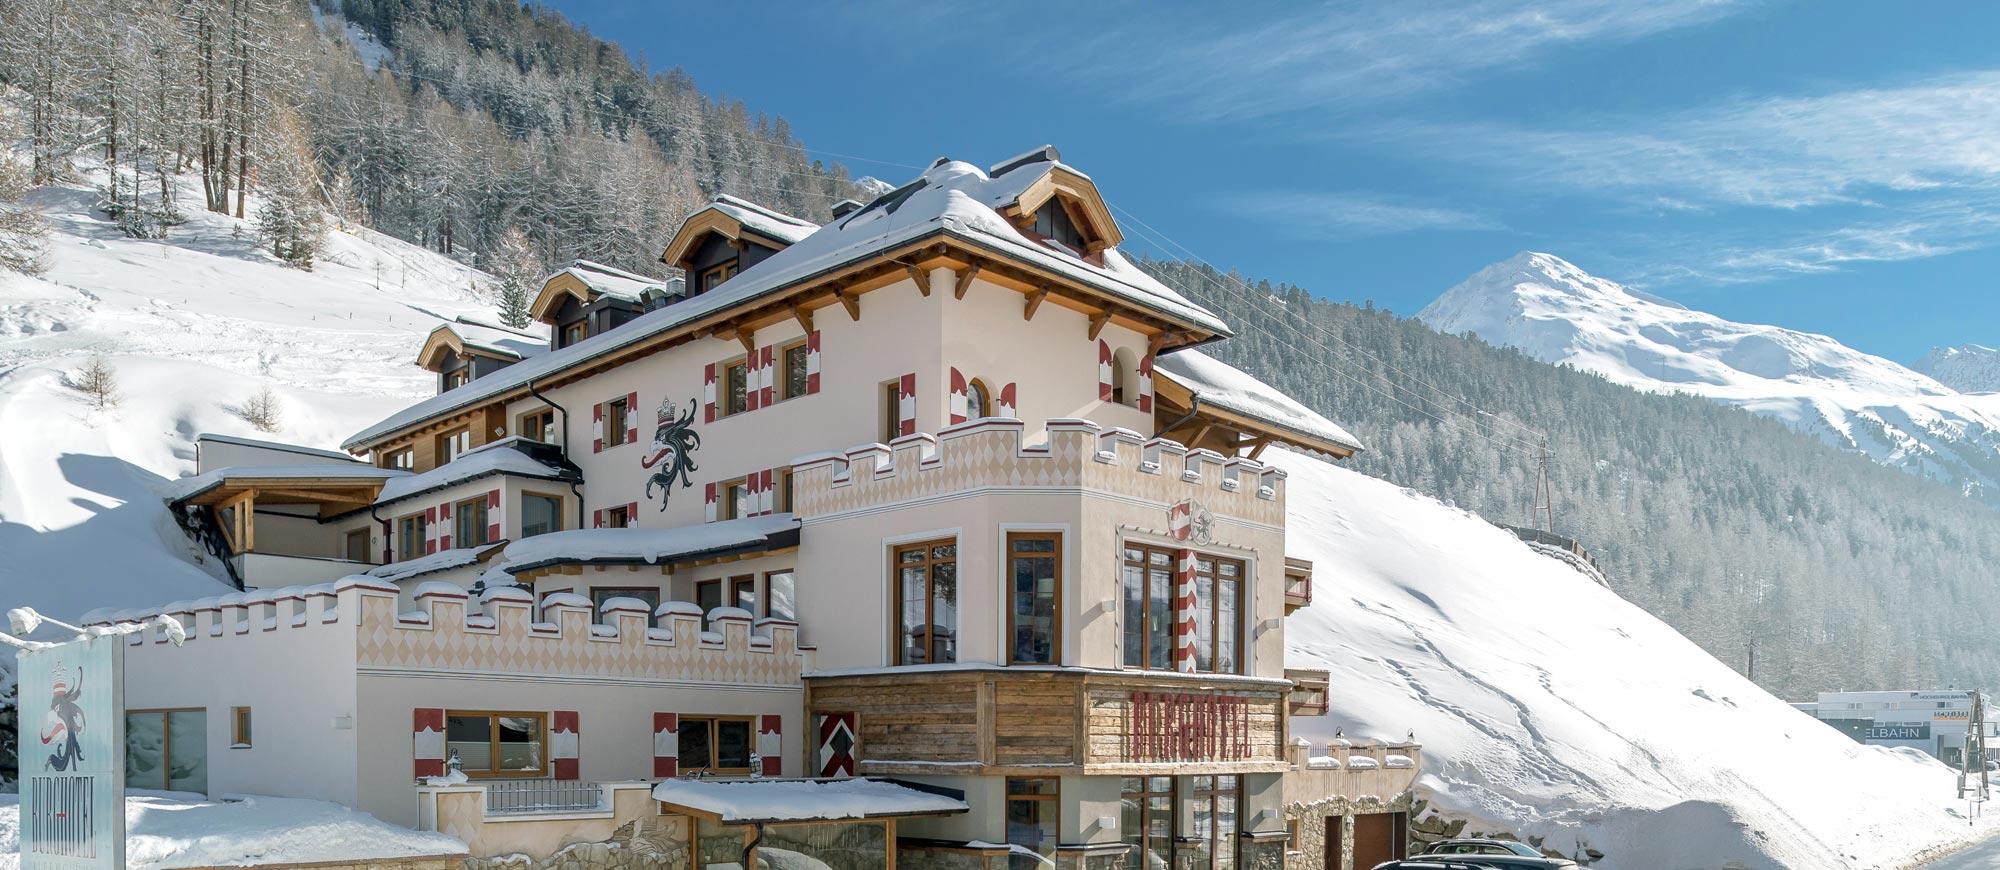 Ötztal: Skihotel an der Piste Obergurgl mit HP.